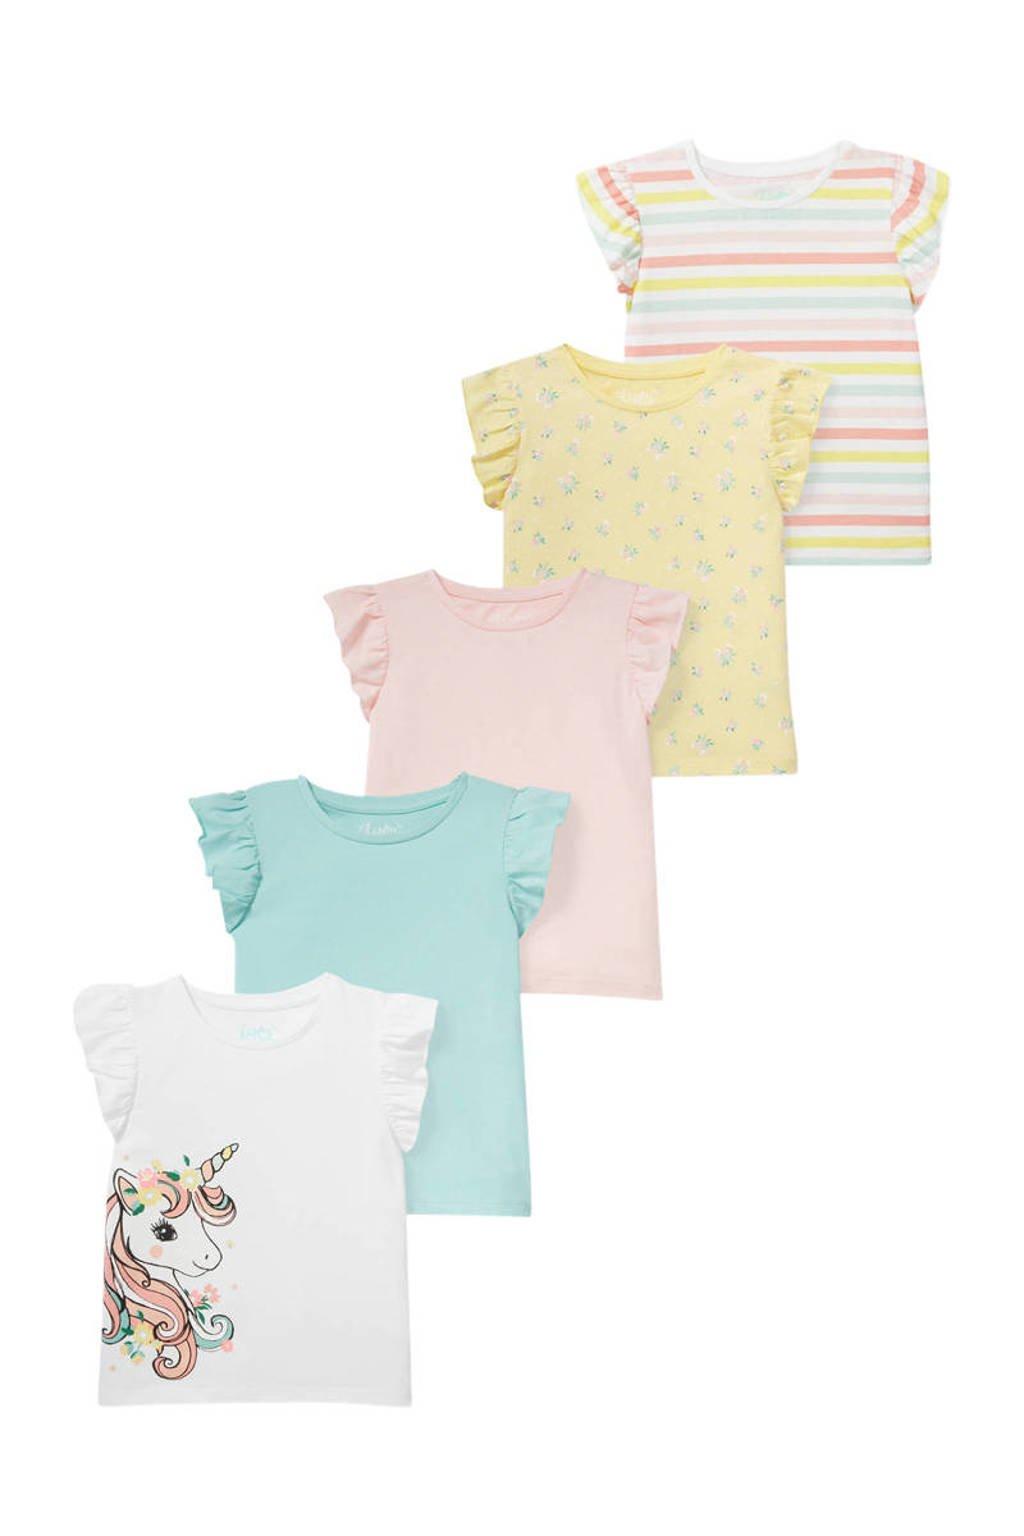 C&A Happy girls Club T-shirt - set van 5 multi, Wit/mintgroen/roze/geel